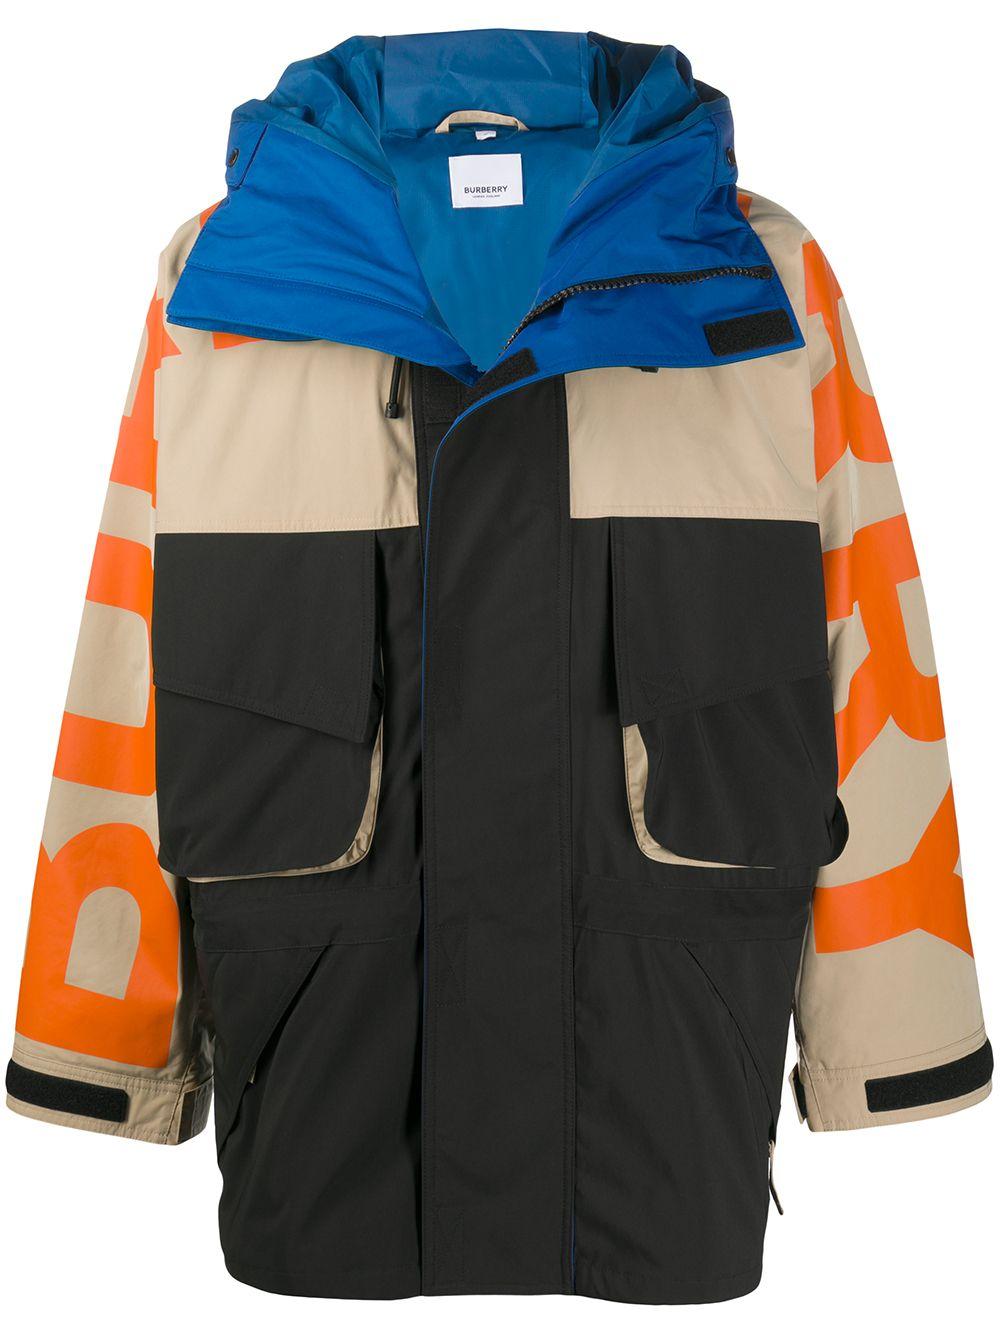 Parkhurst Jacket